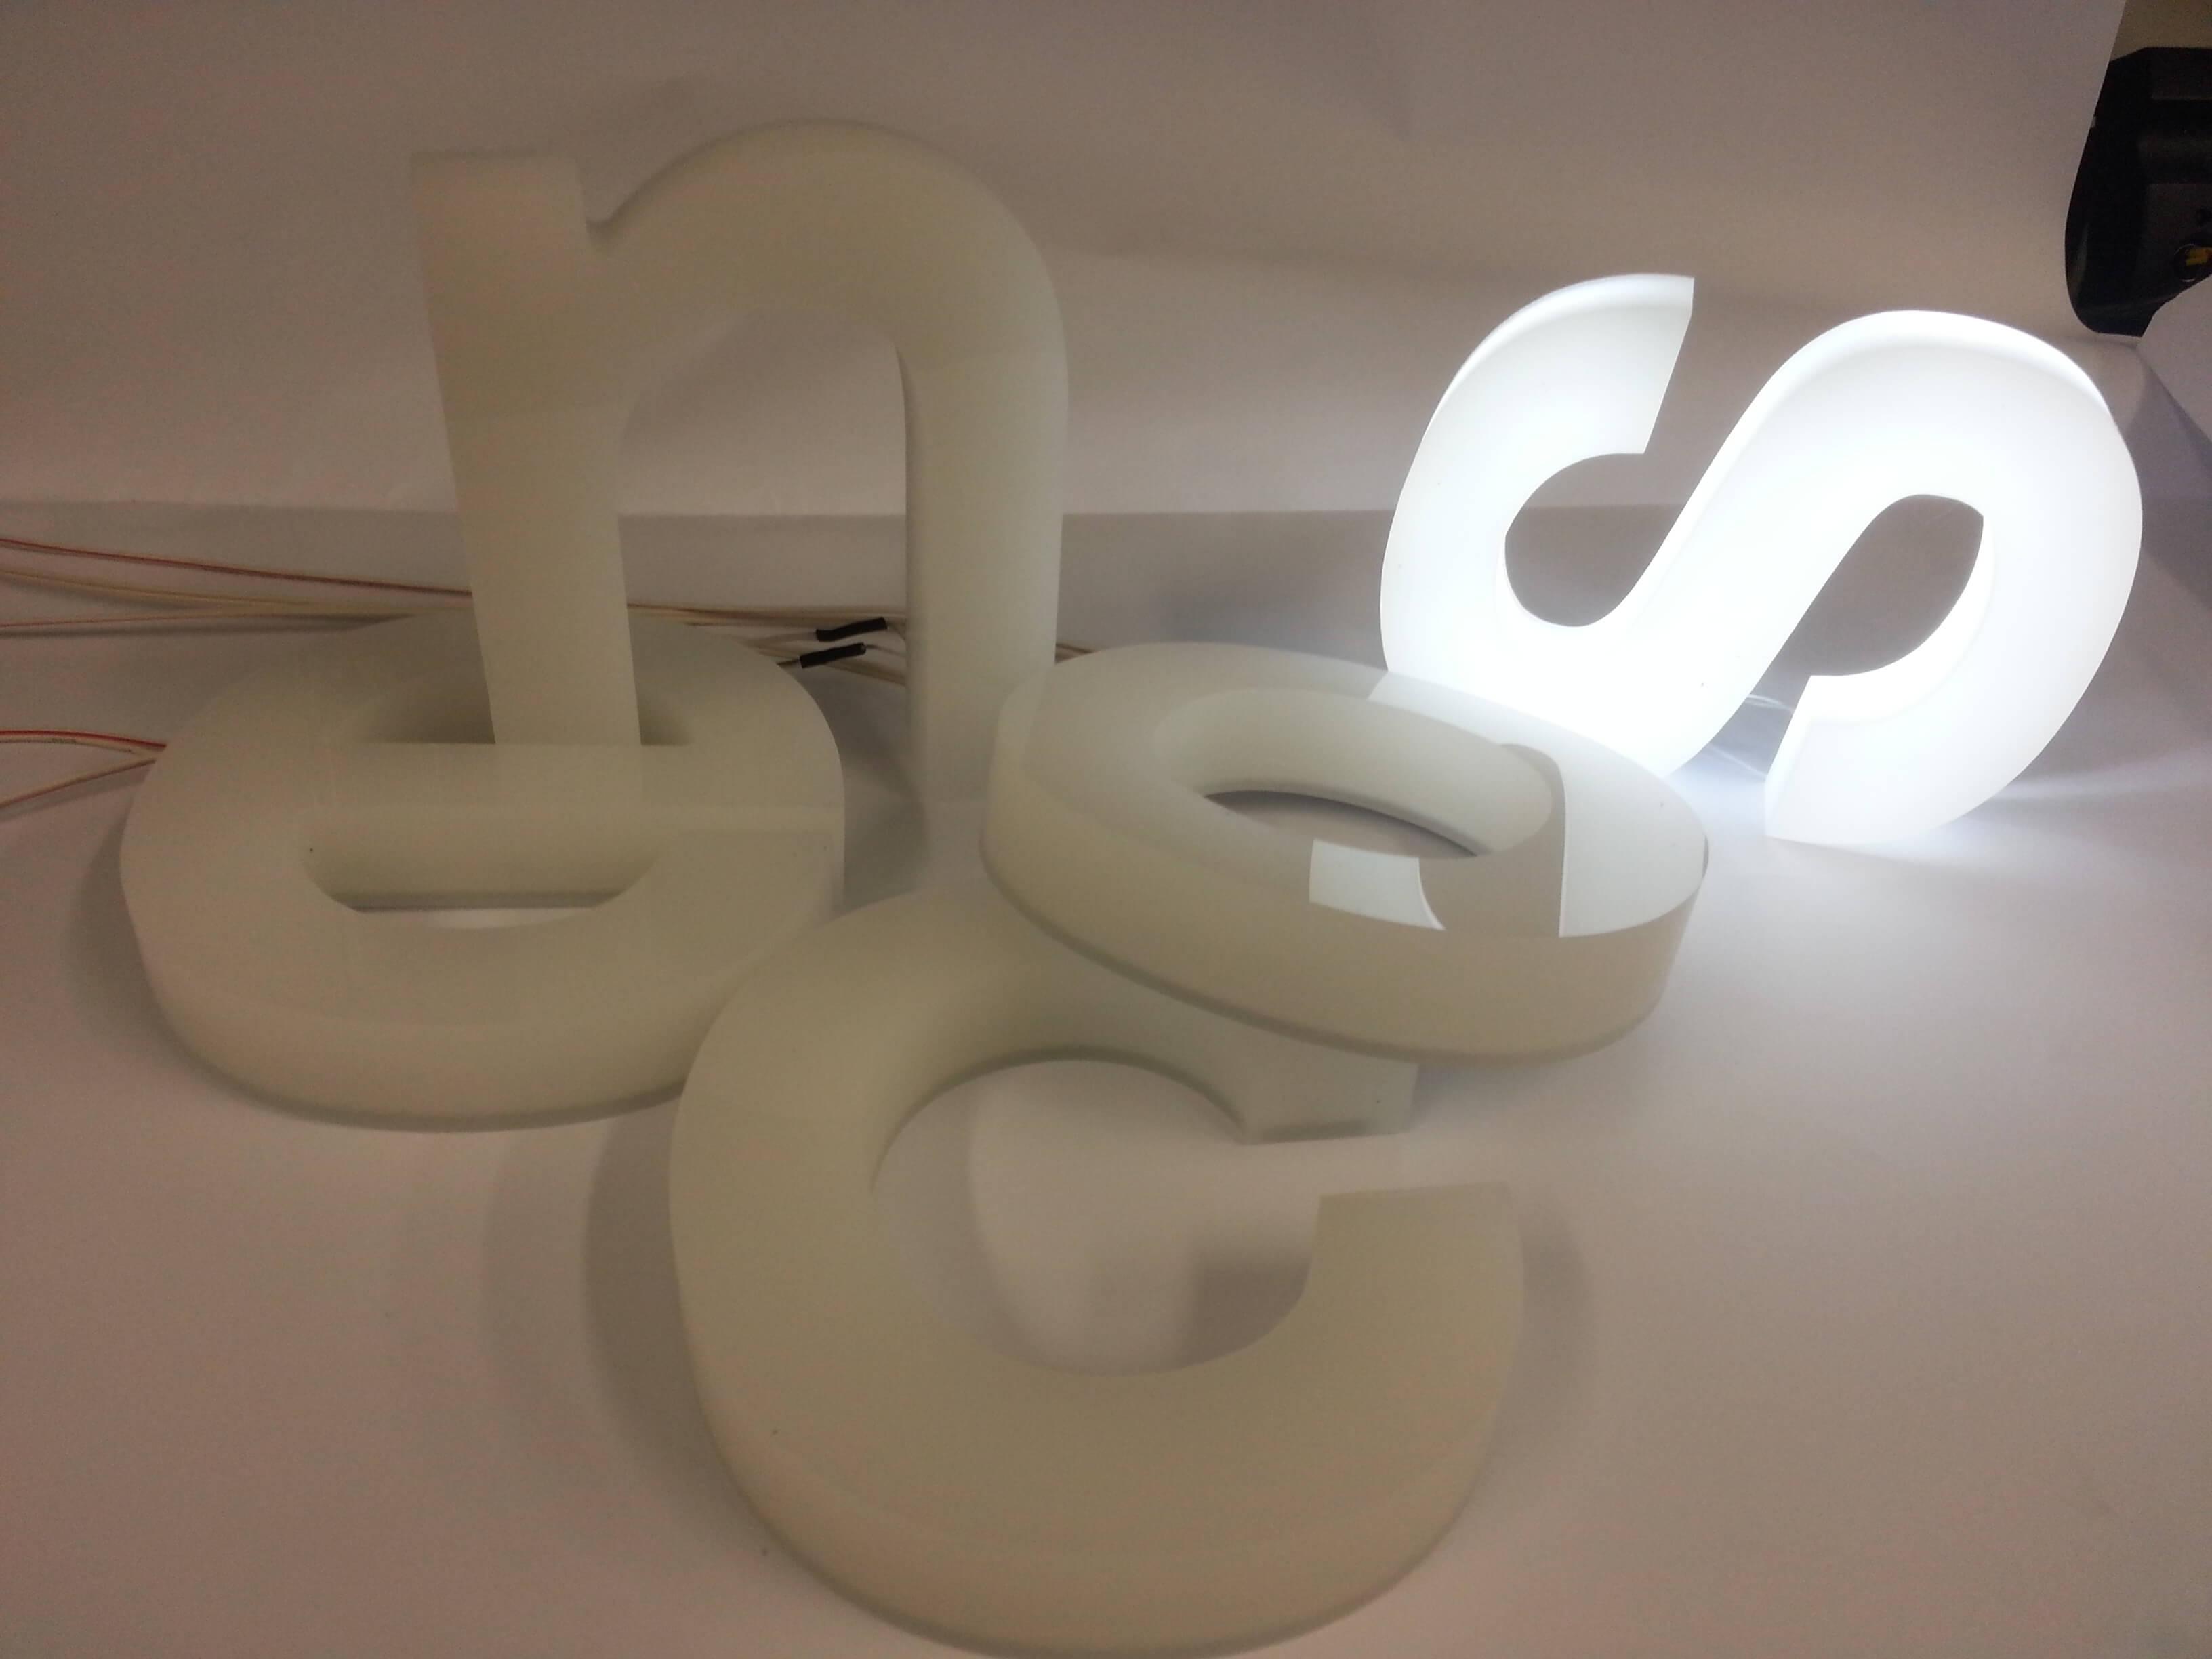 eclairage type bo tier pialex fabricant enseignes lumineuses. Black Bedroom Furniture Sets. Home Design Ideas